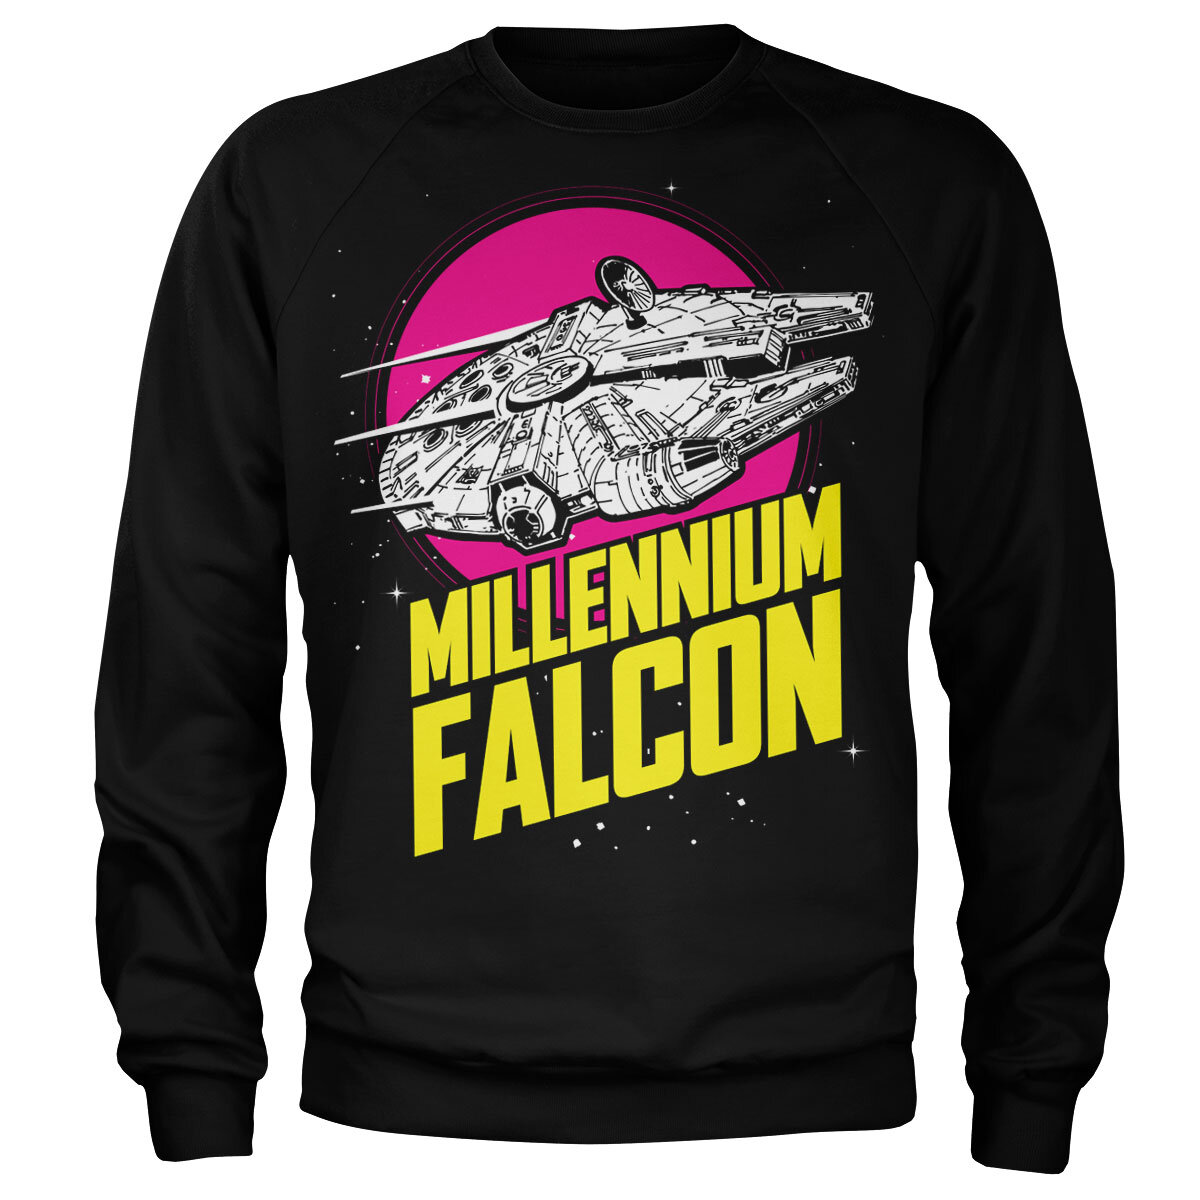 Millennium Falcon Retro Sweatshirt